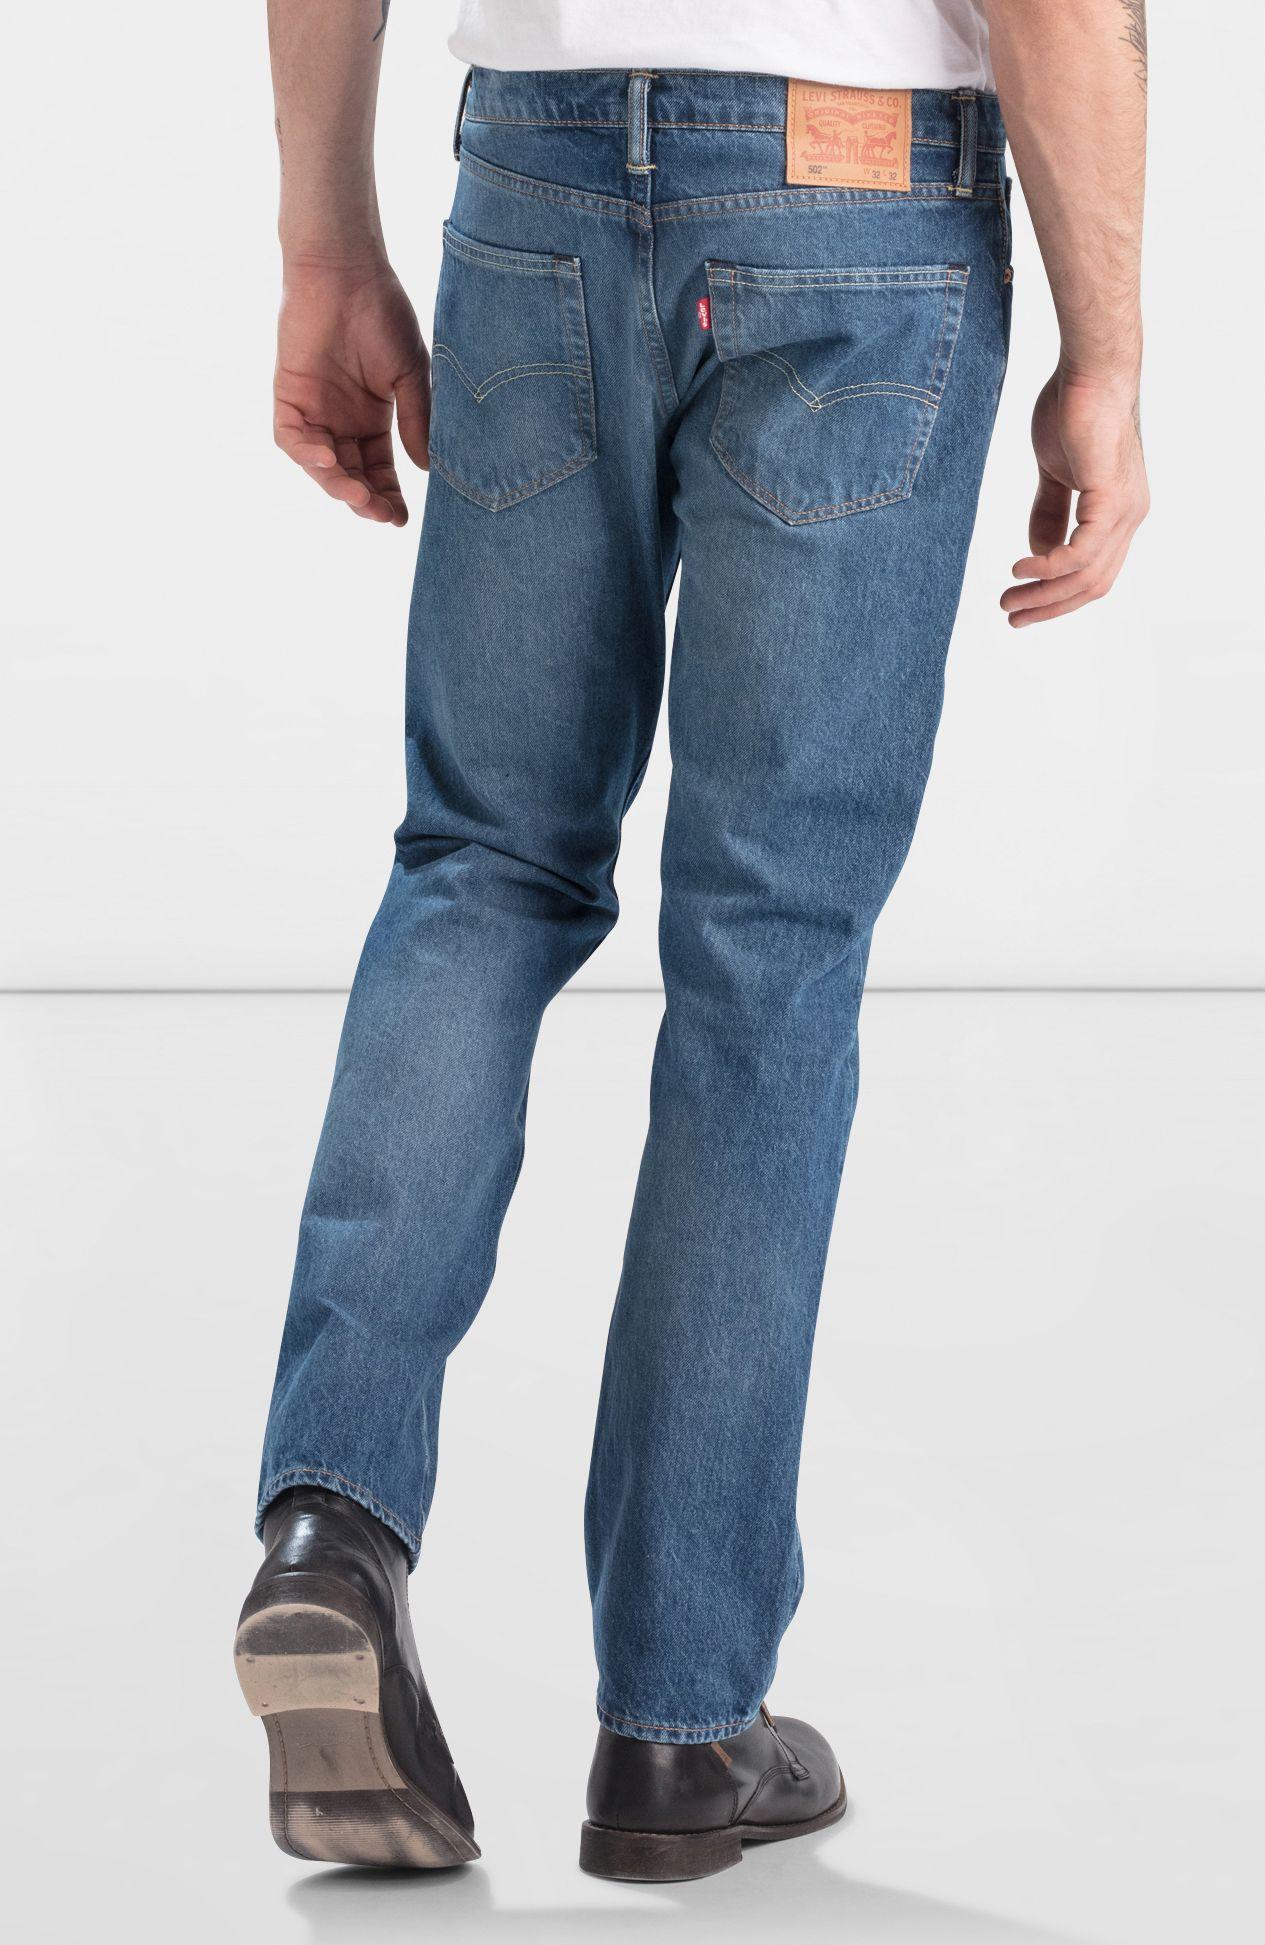 LEVIS Jeanshose Jeans 29507-0104 502 REGULAR TAPER MIDCITY W18-LJJ1